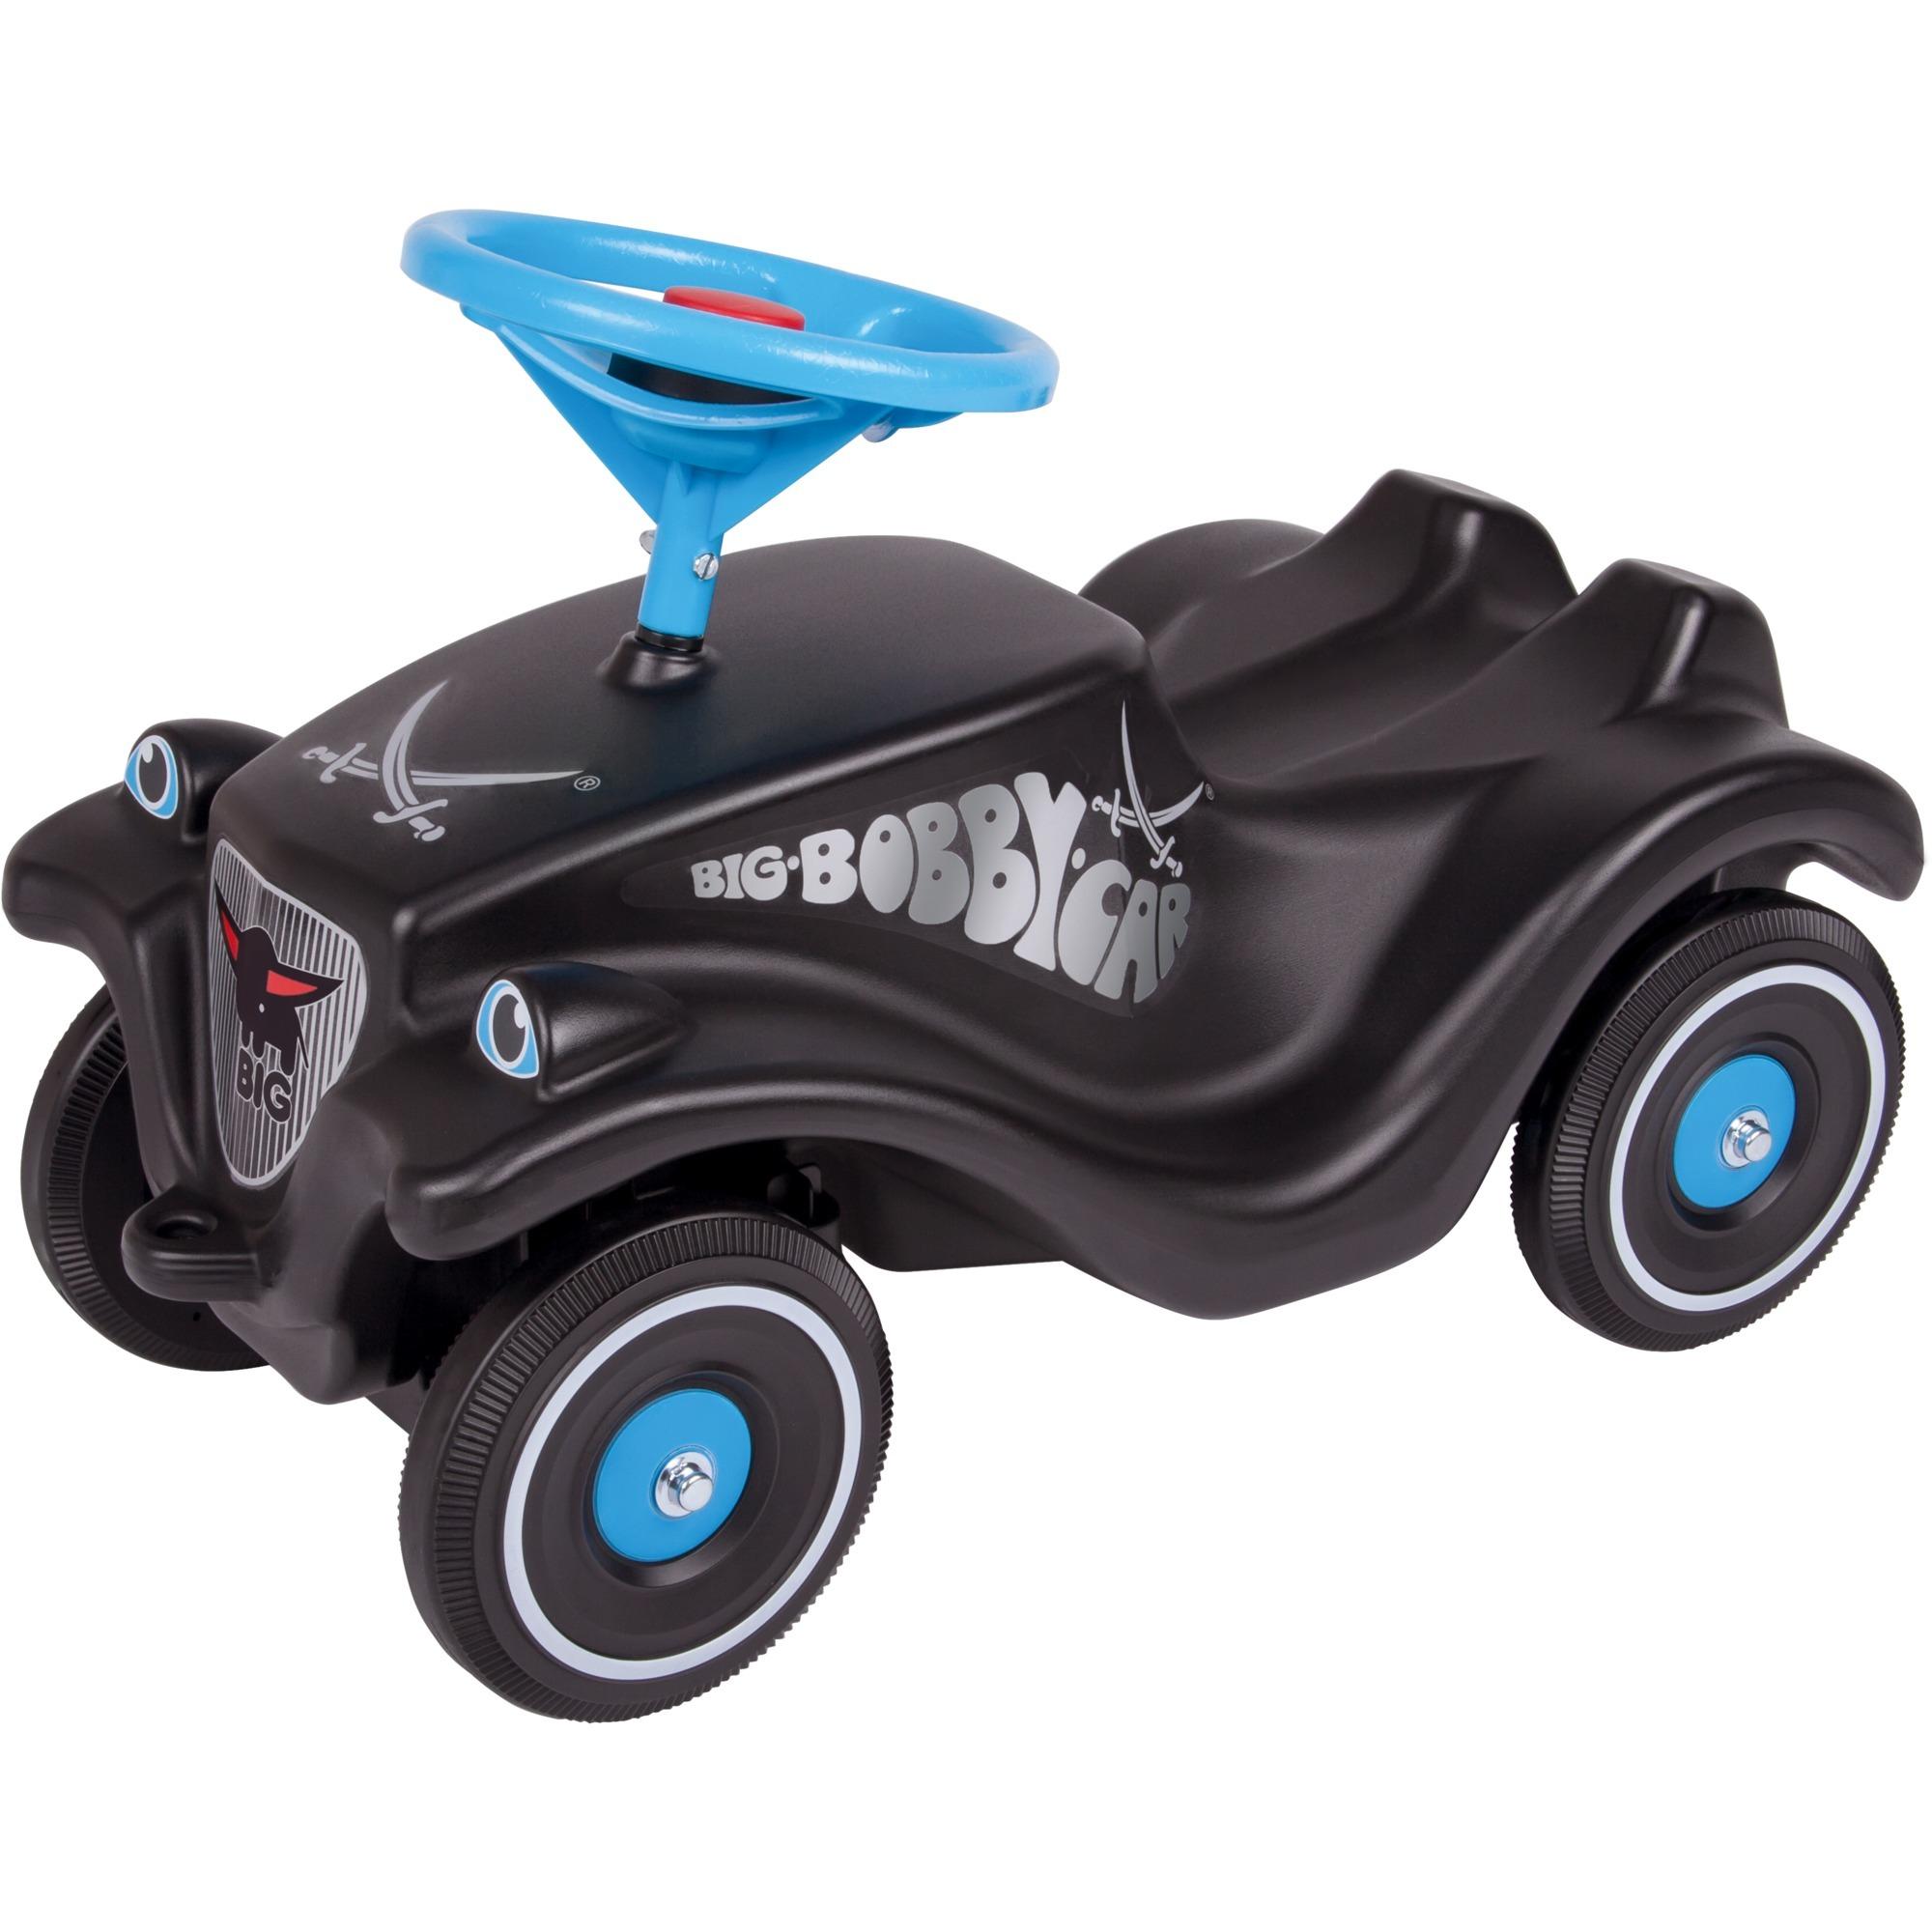 800056093 juguete de montar Apertura por empuje Coche, Tobogán